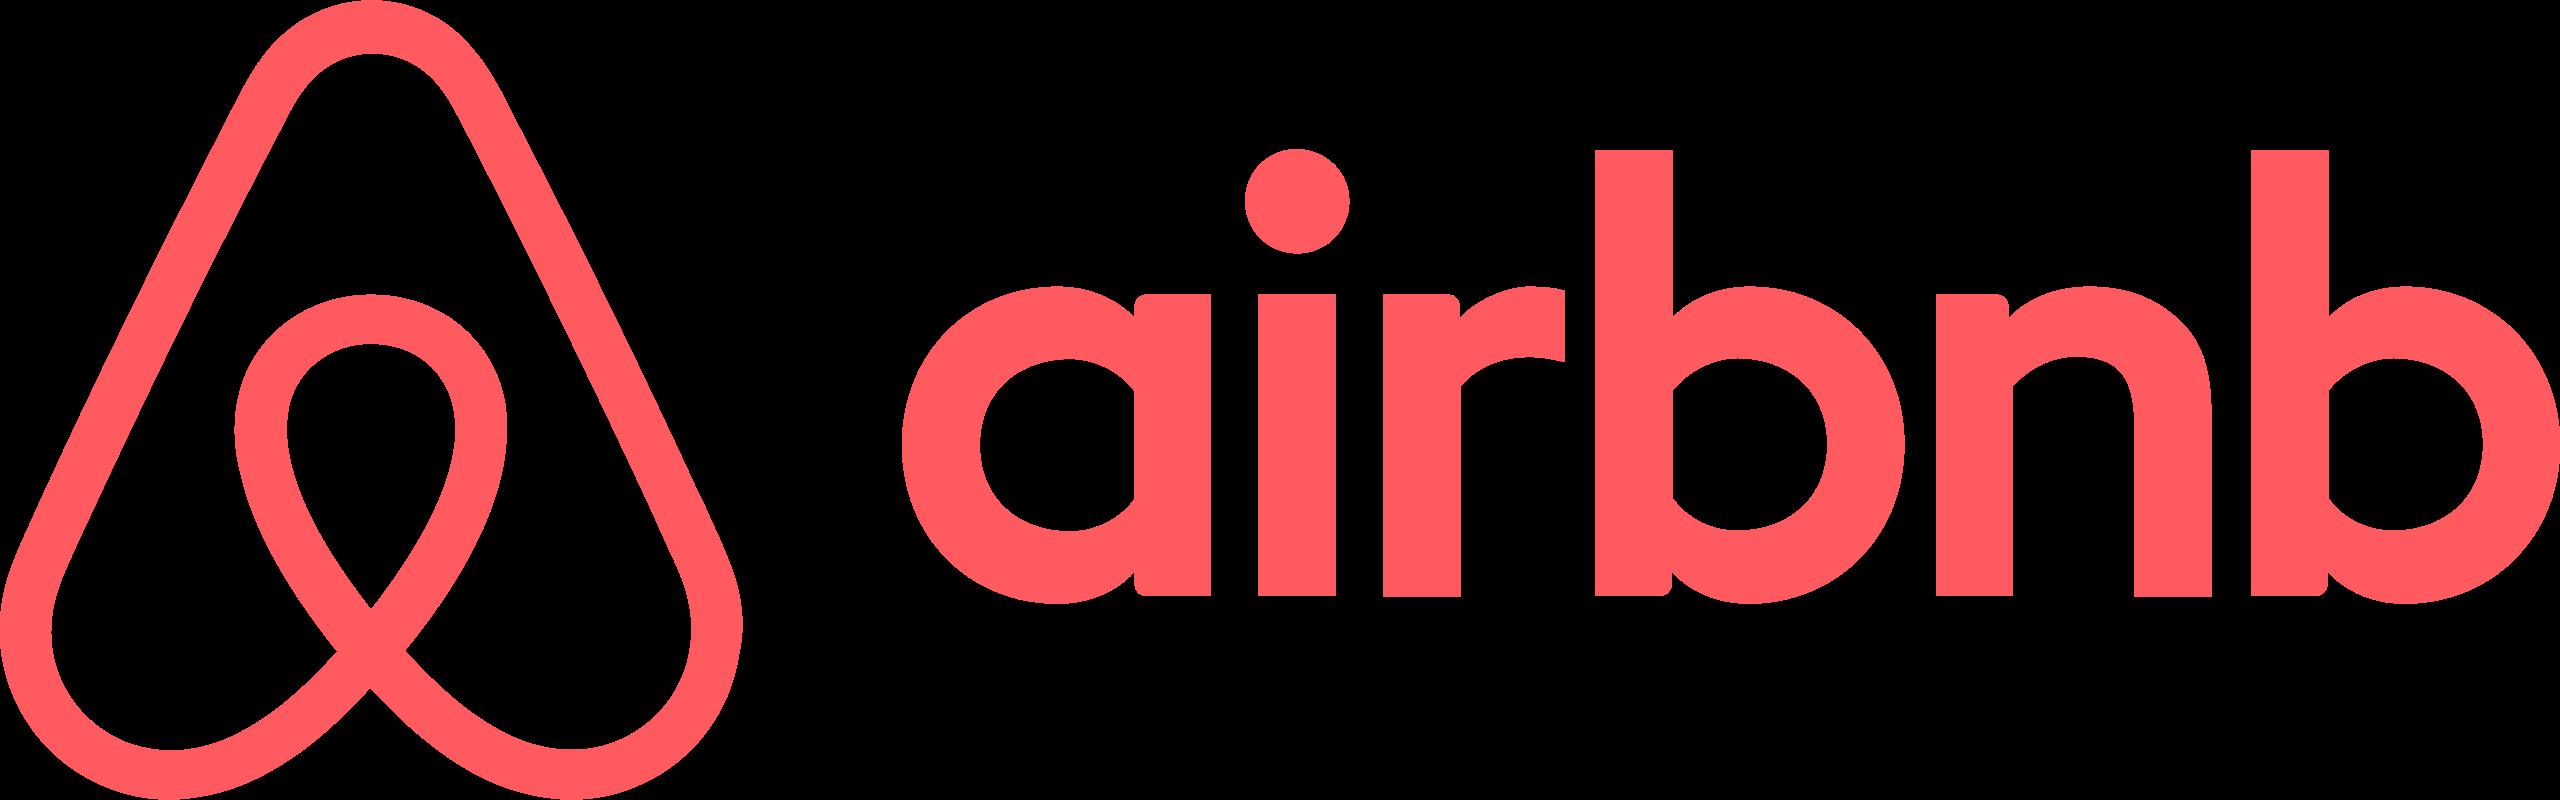 Logo Airbnb - Triderland kitesurf school